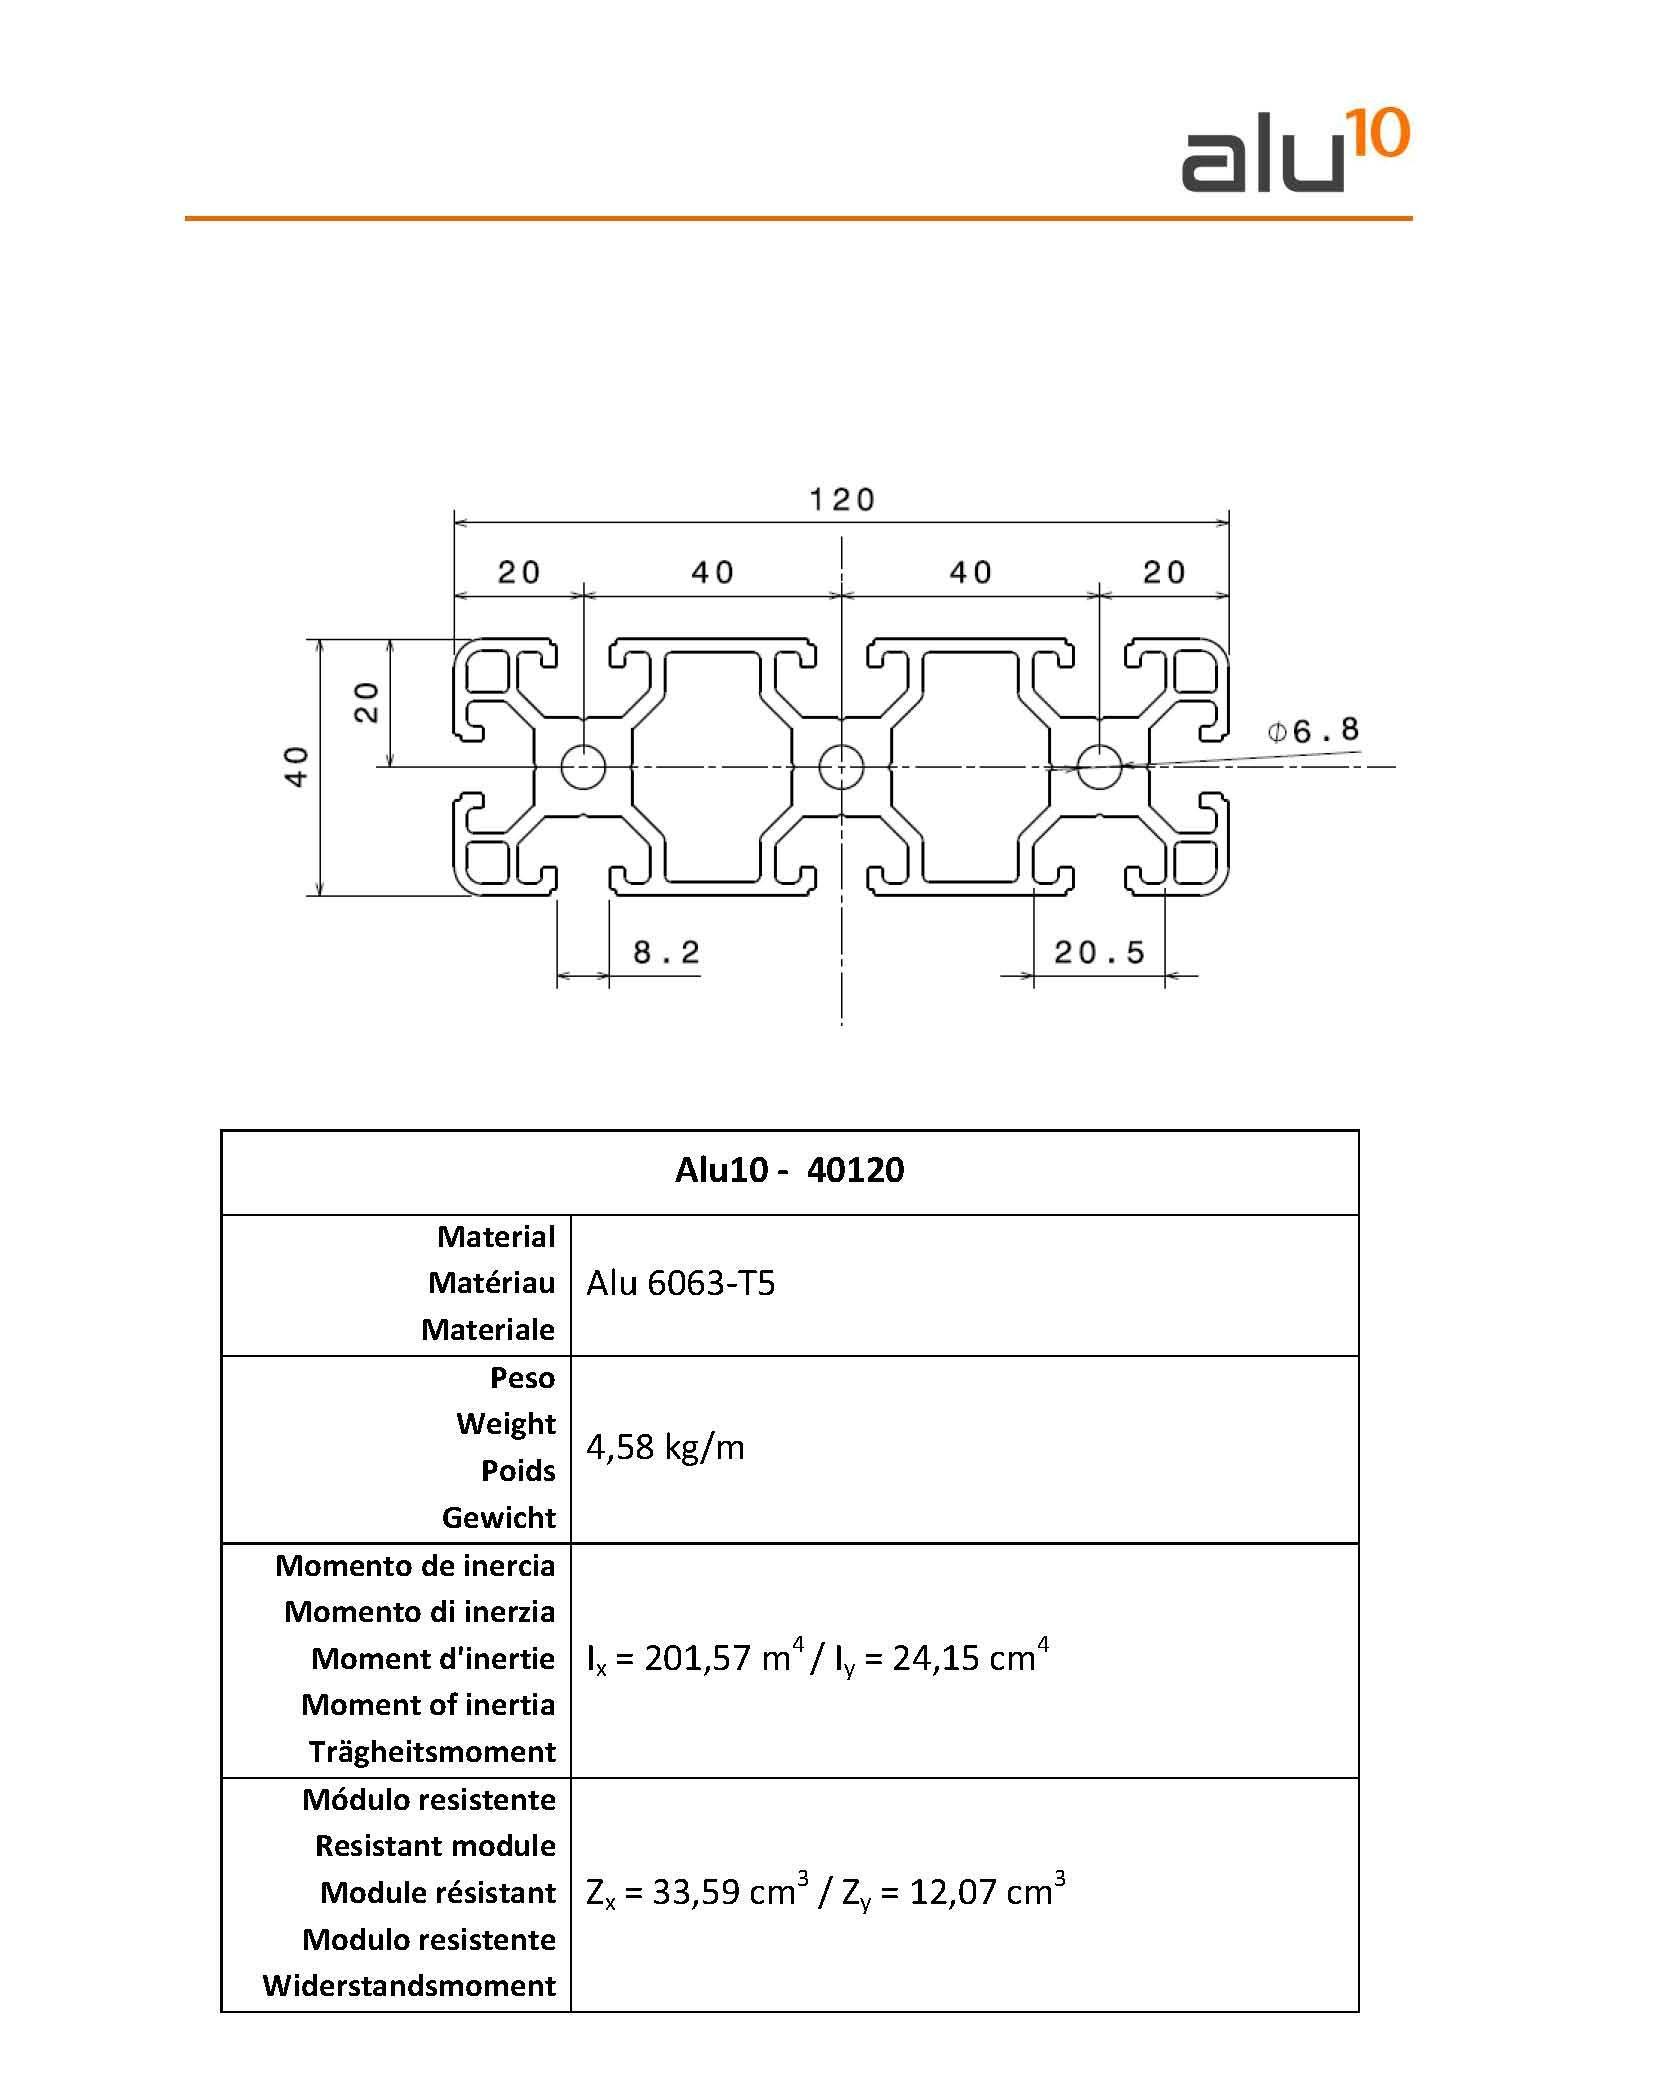 Aluminum slot profile 40120 - CNC